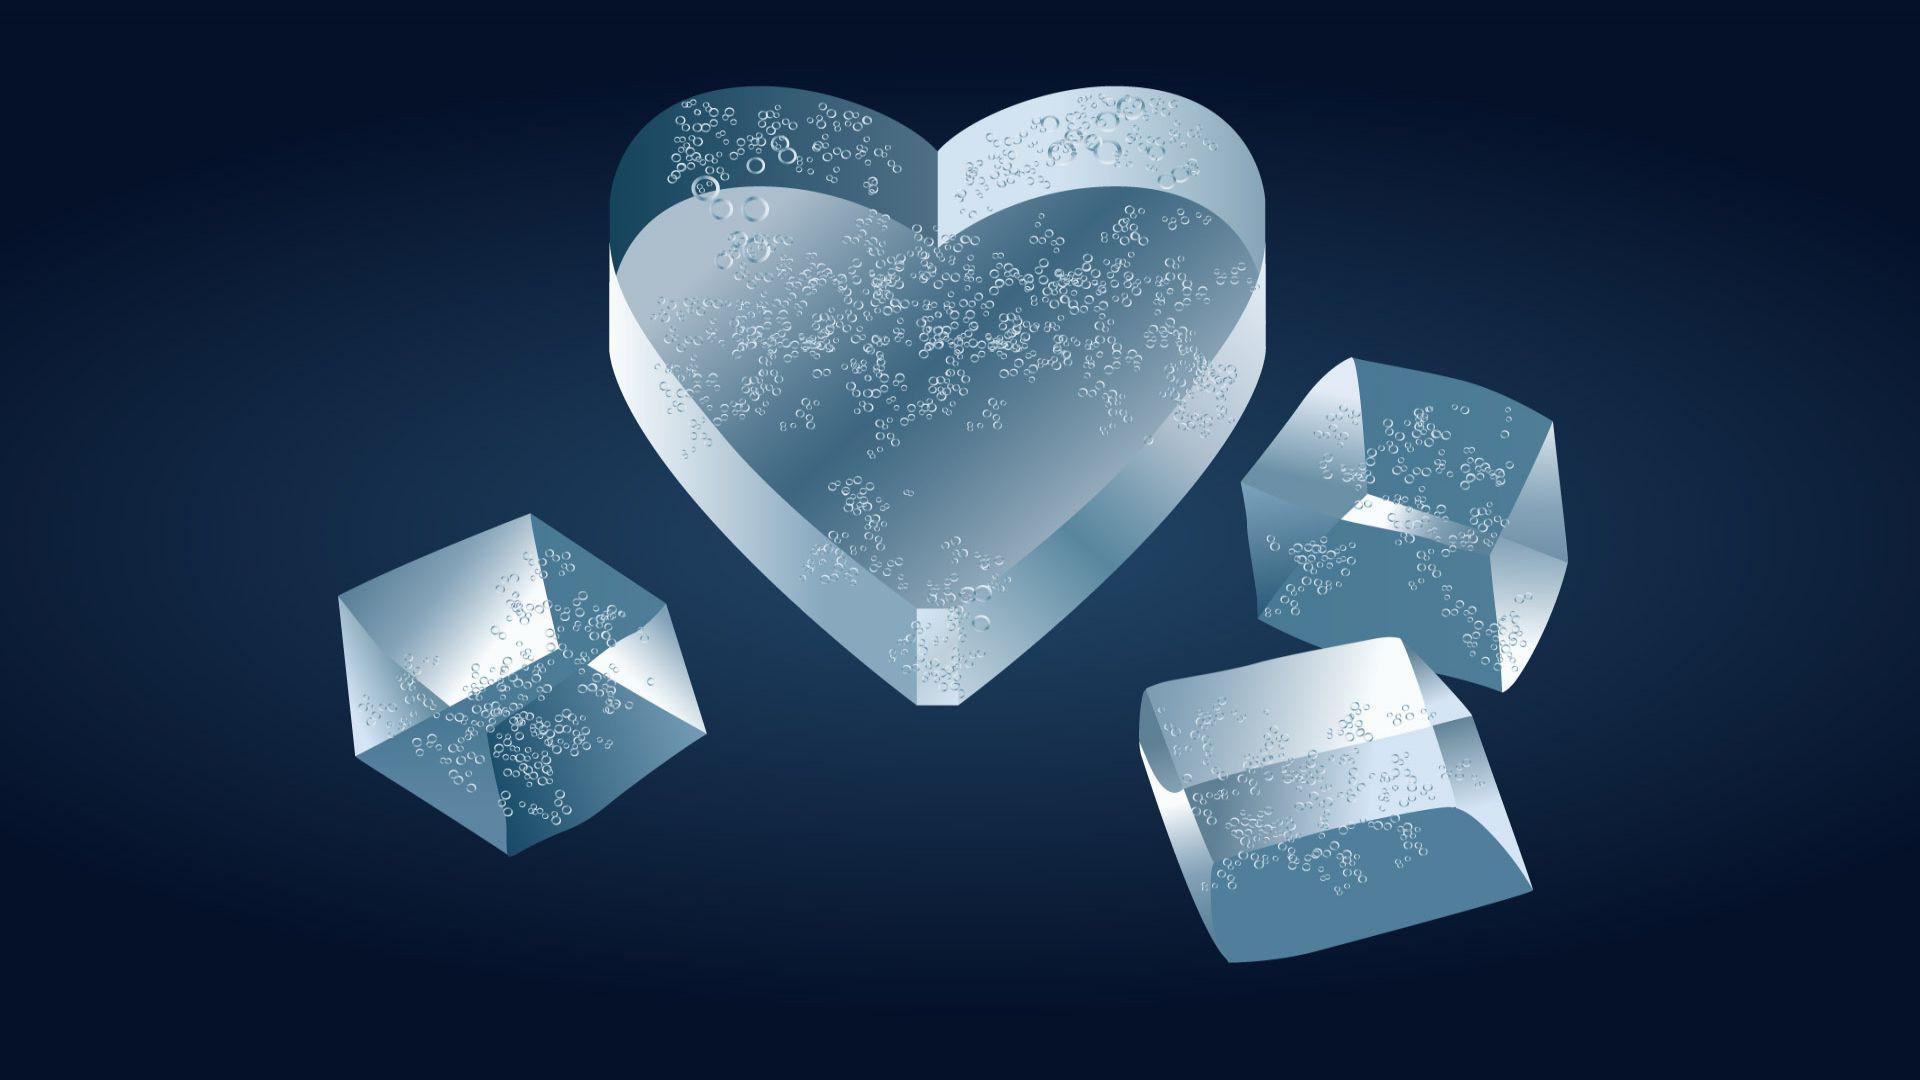 Heart shaped ice cube wallpaper – 479869